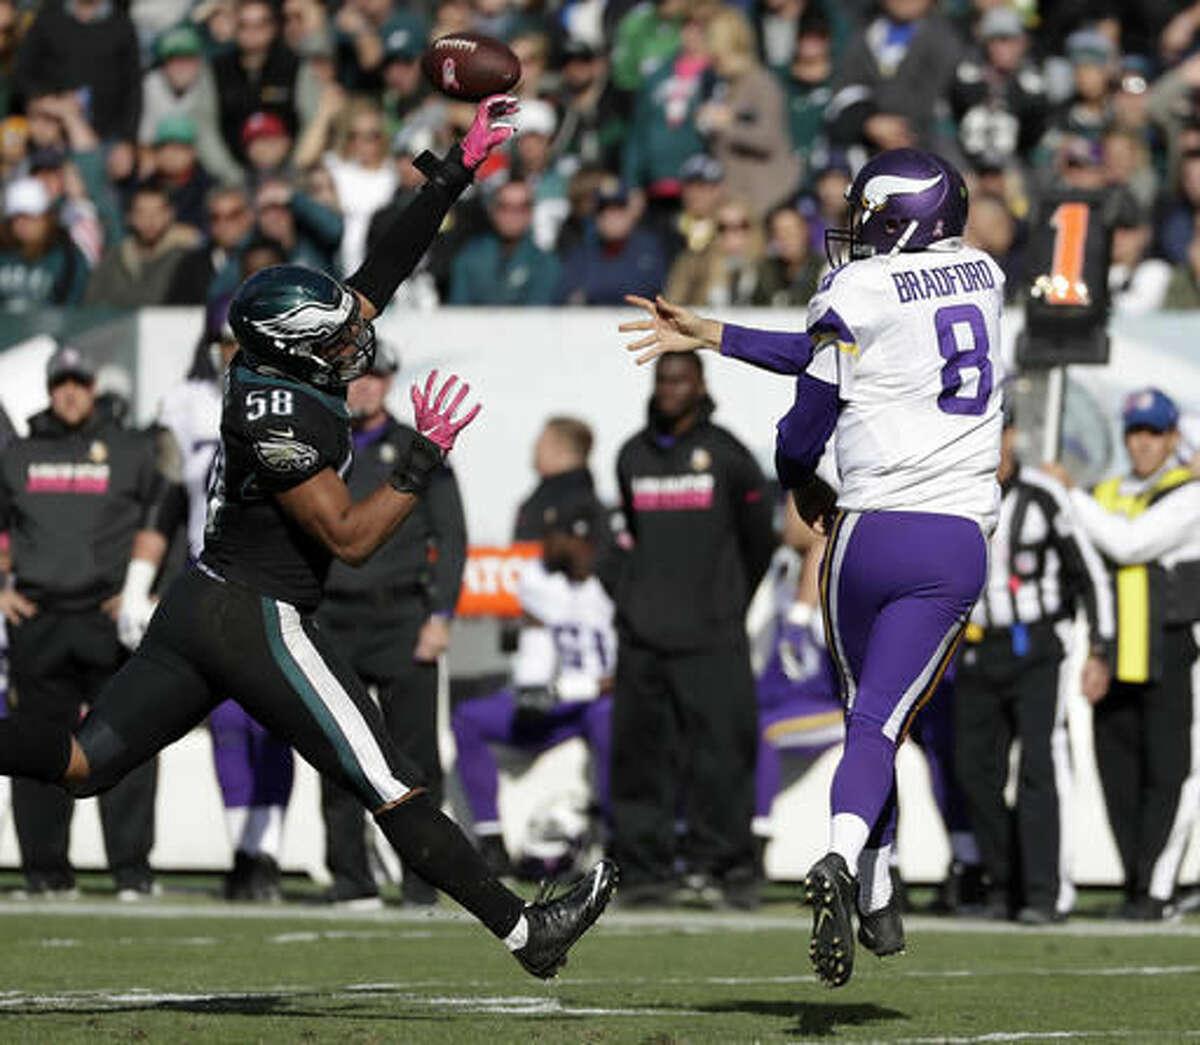 Minnesota Vikings' Sam Bradford, right, tries to pass against Philadelphia Eagles' Jordan Hicks during the second half of an NFL football game, Sunday, Oct. 23, 2016, in Philadelphia. (AP Photo/Michael Perez)